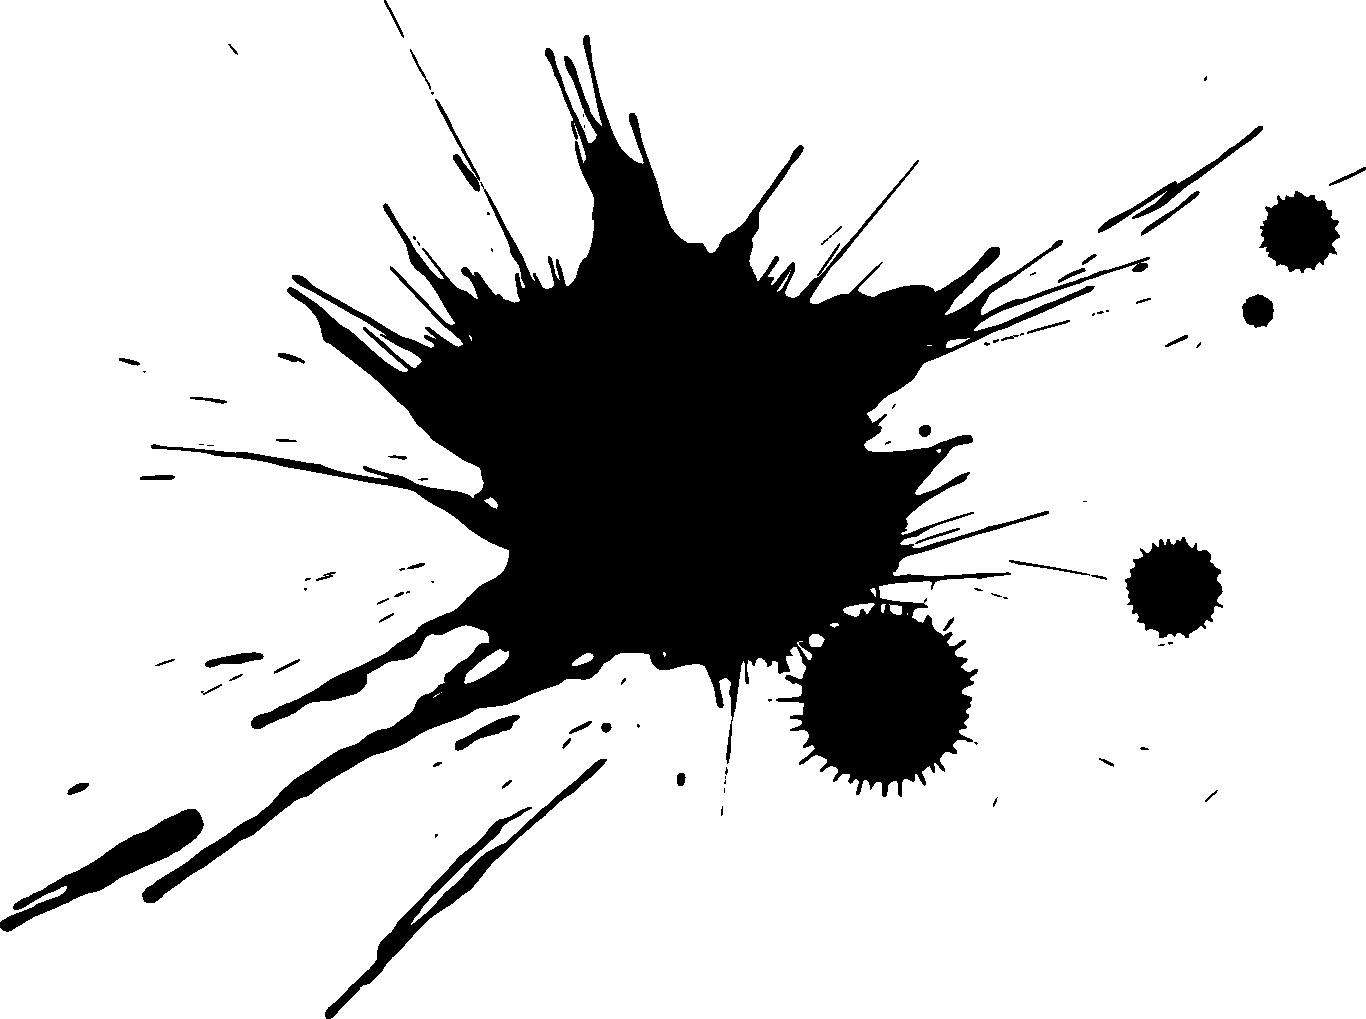 paint-splatter-13.png